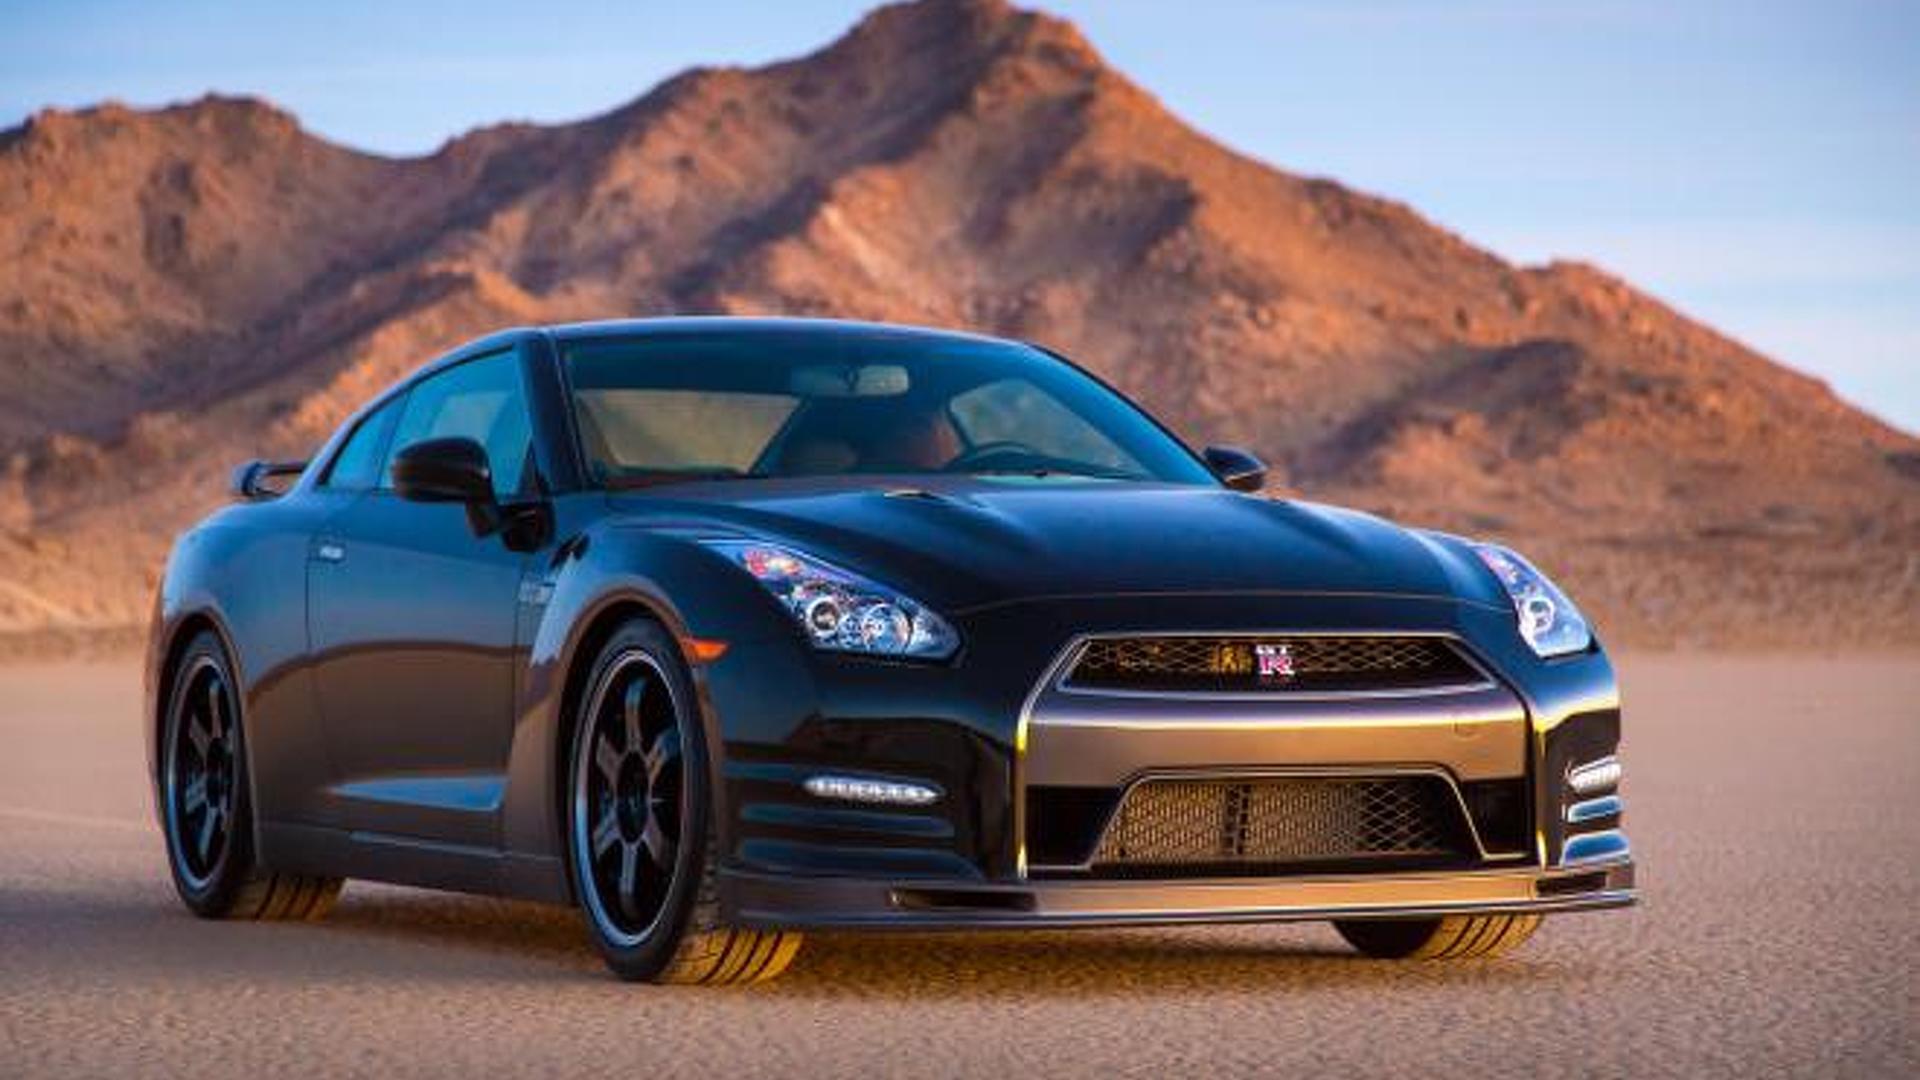 Nissan exec confirms brutal appearance & hybrid powertrain for next GT-R - report